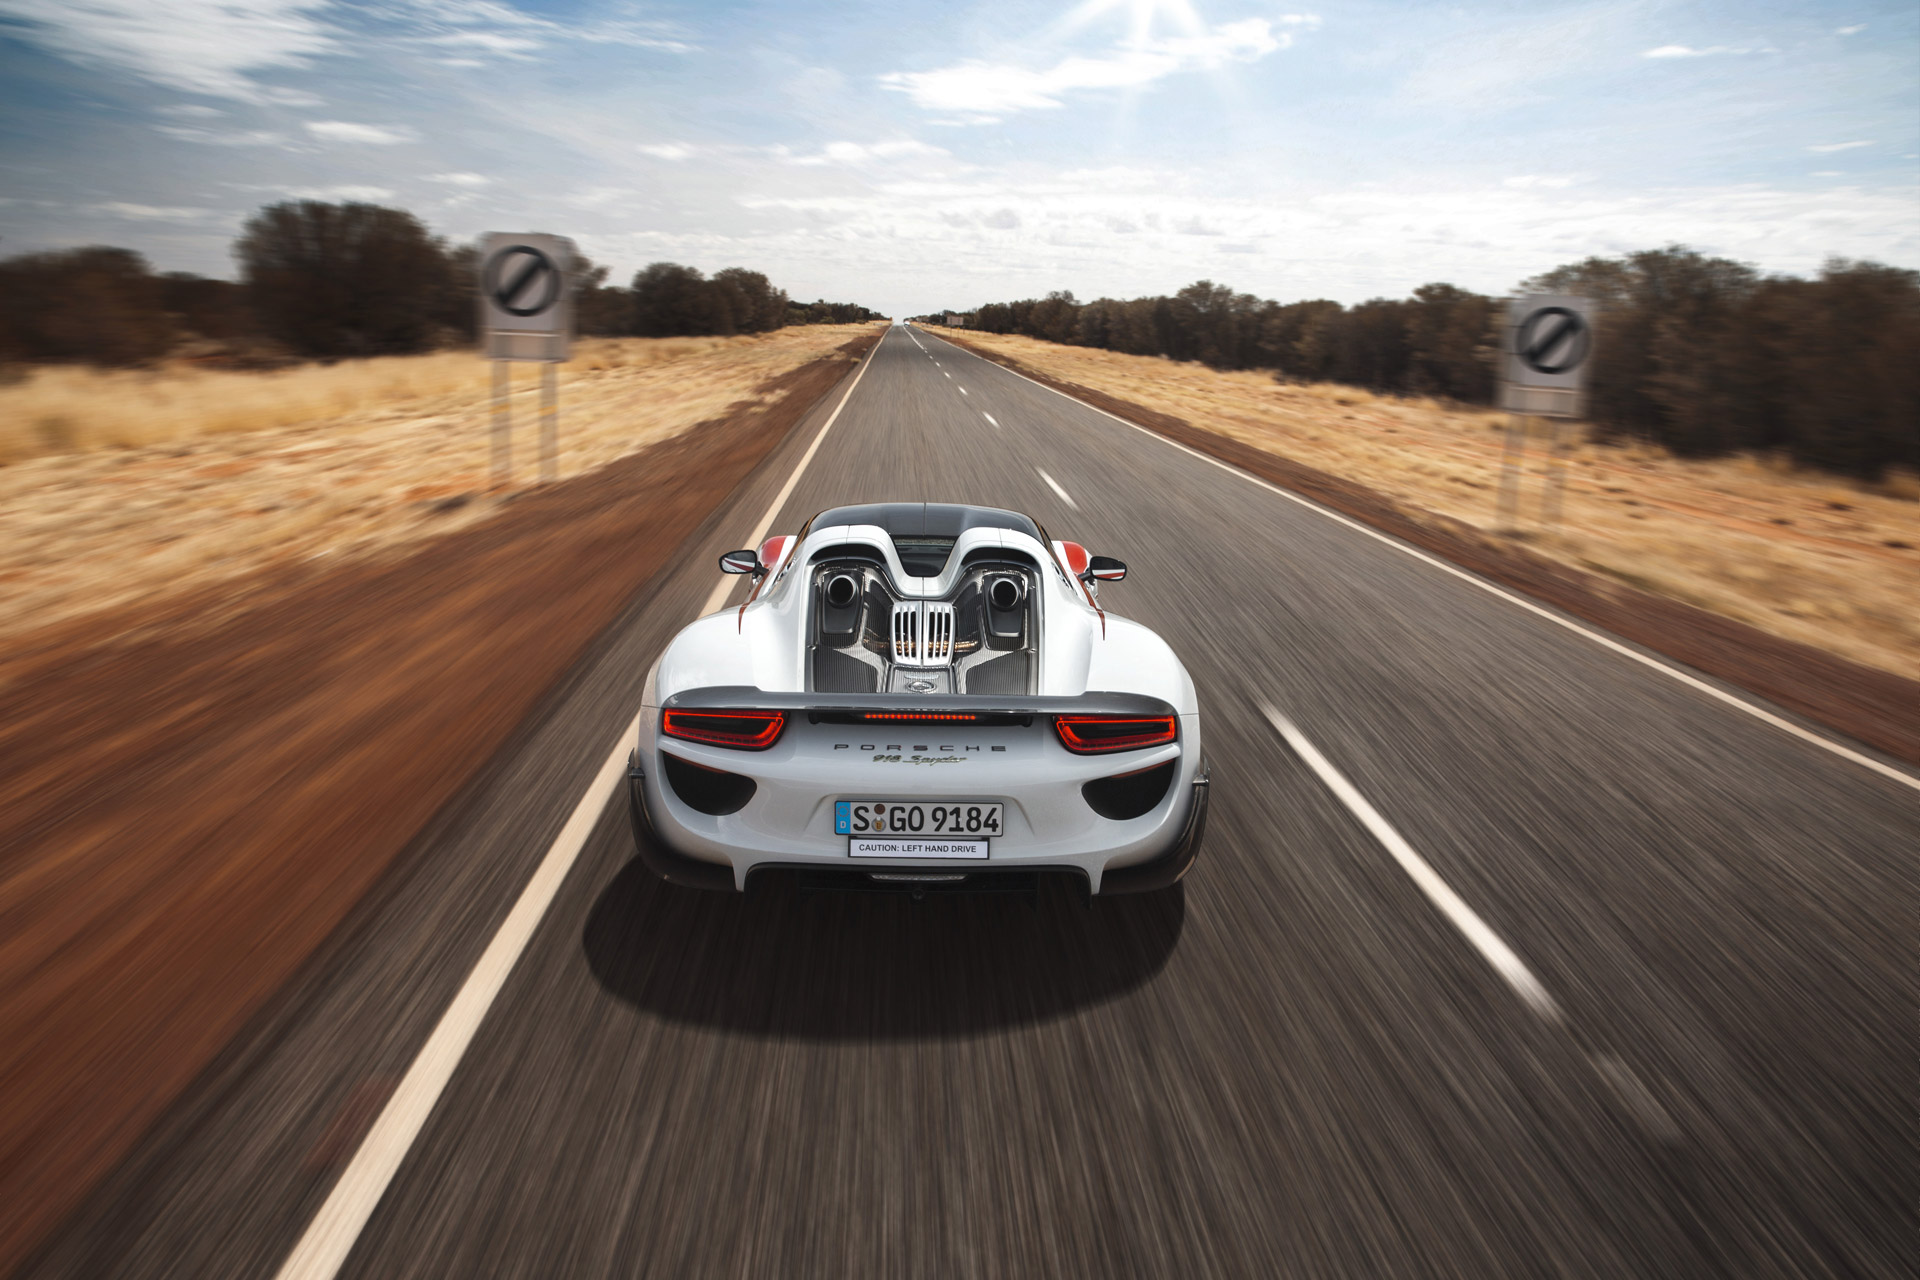 porsche-918-spyder-australian-outback-1 Remarkable Porsche 918 Spyder On the Road Cars Trend